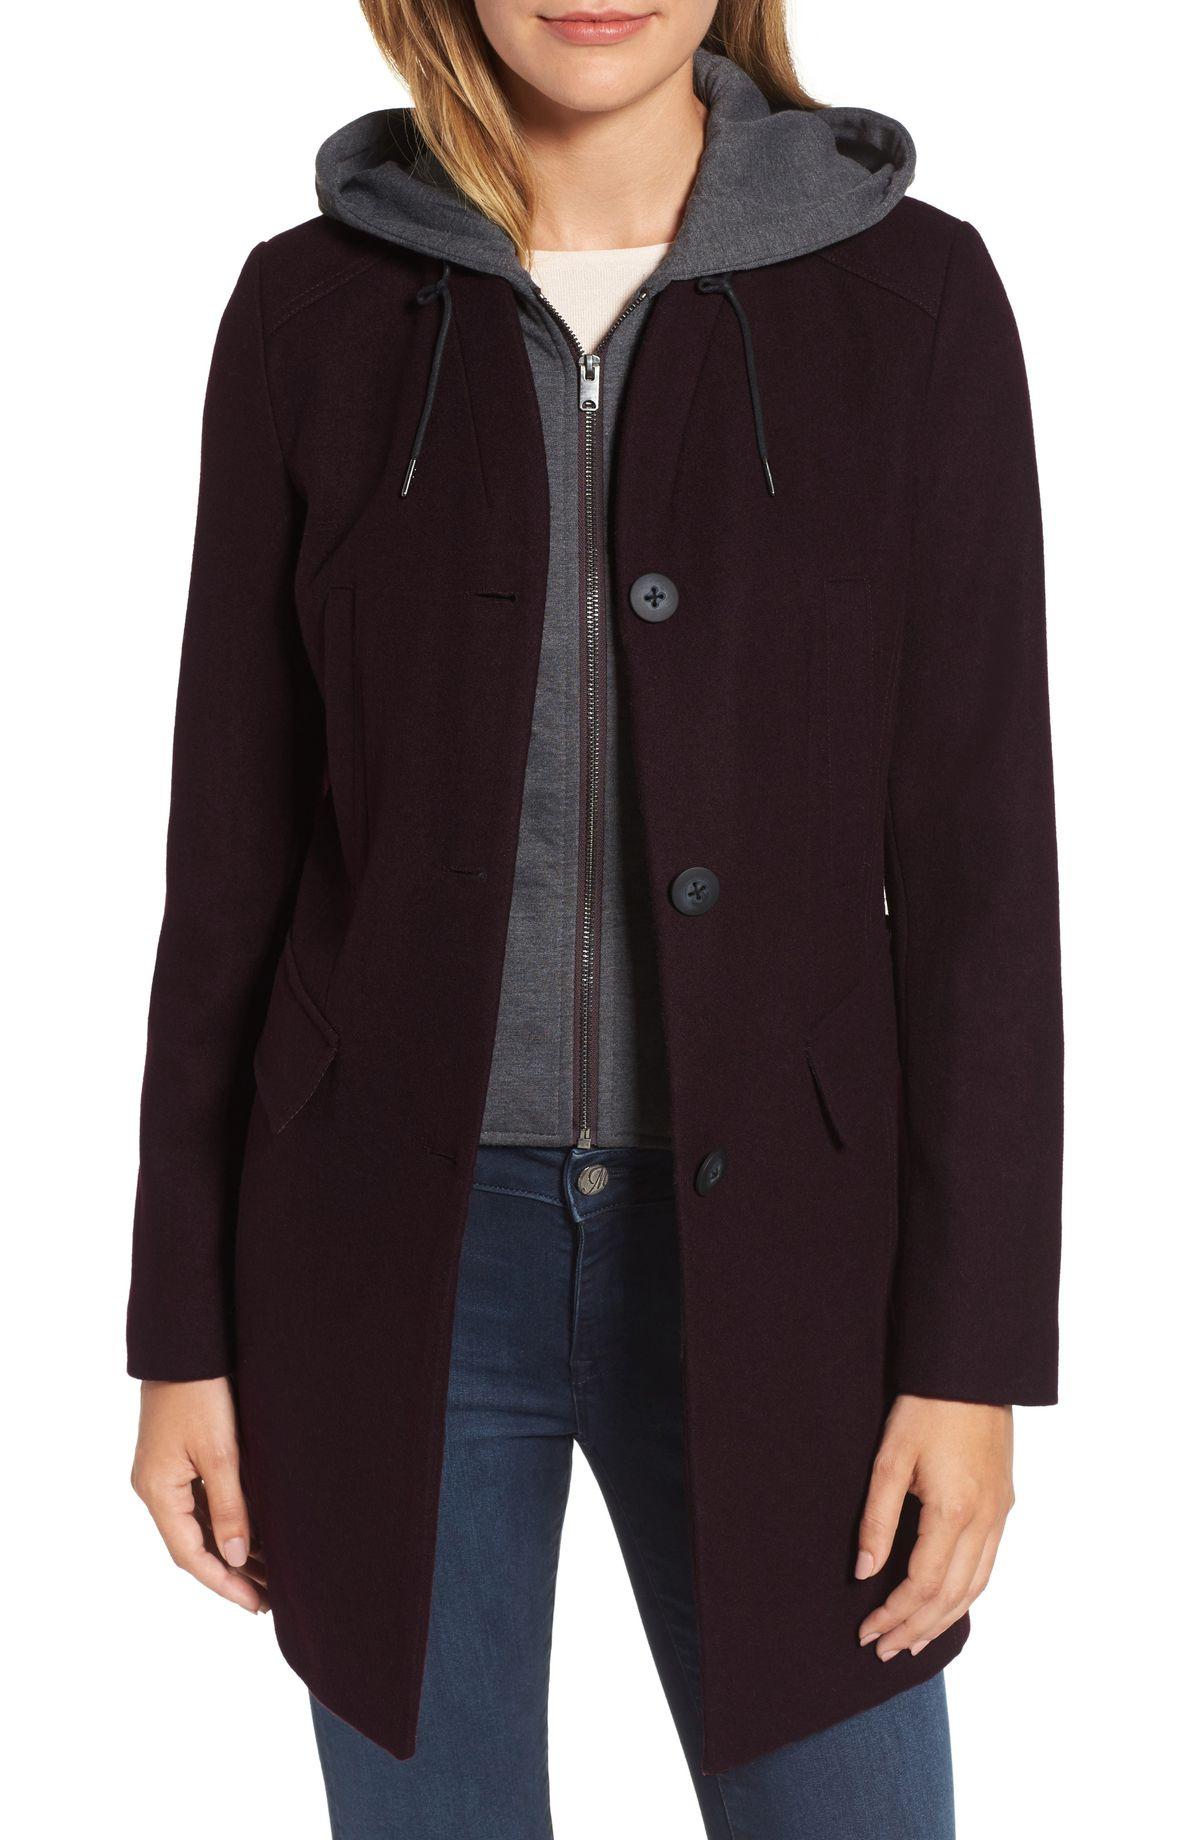 Andrew Marc wool burgundy car coat